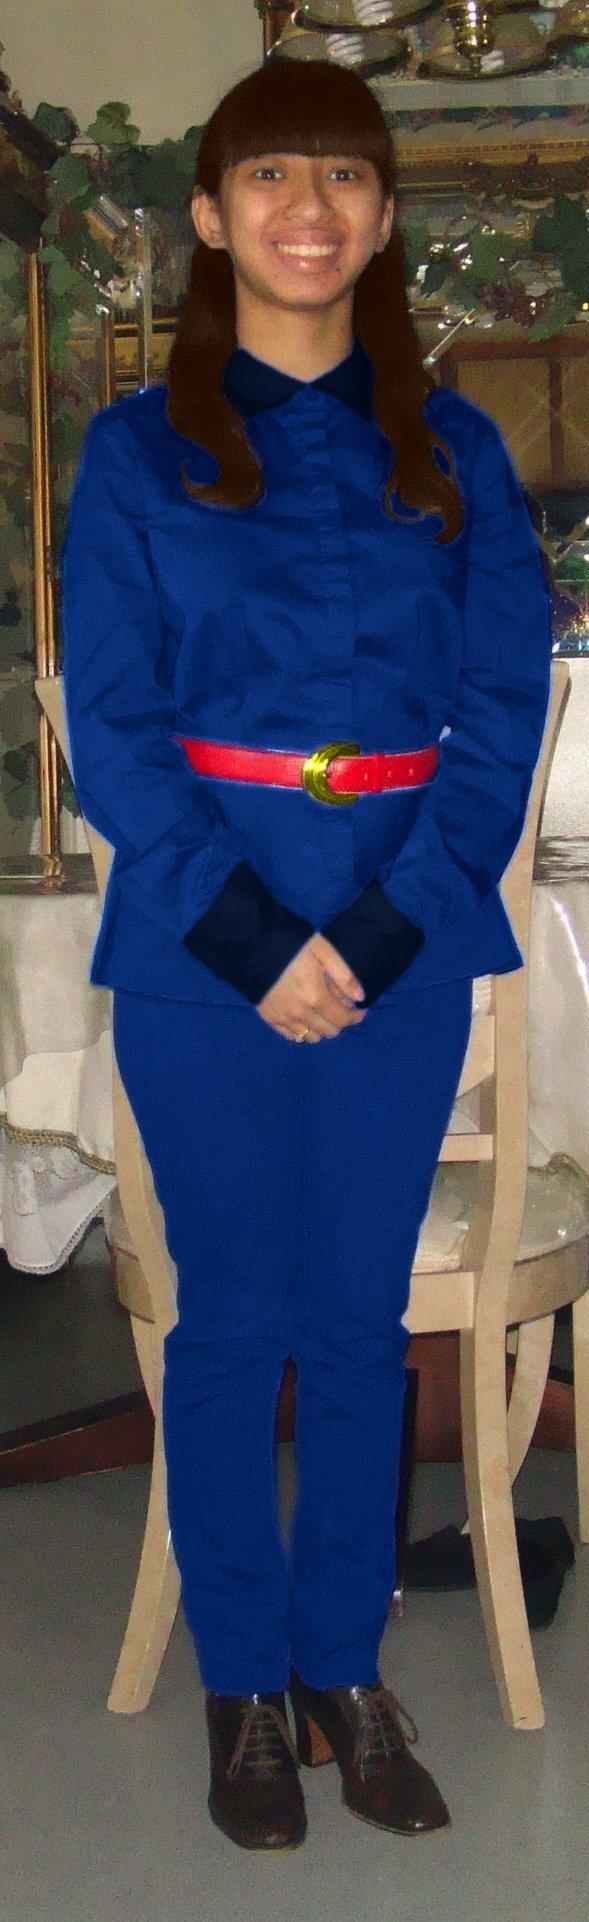 Me as 1971 s Violet Beauregarde in blue attire V 2 by Magic-Kristina    Original Violet Beauregarde